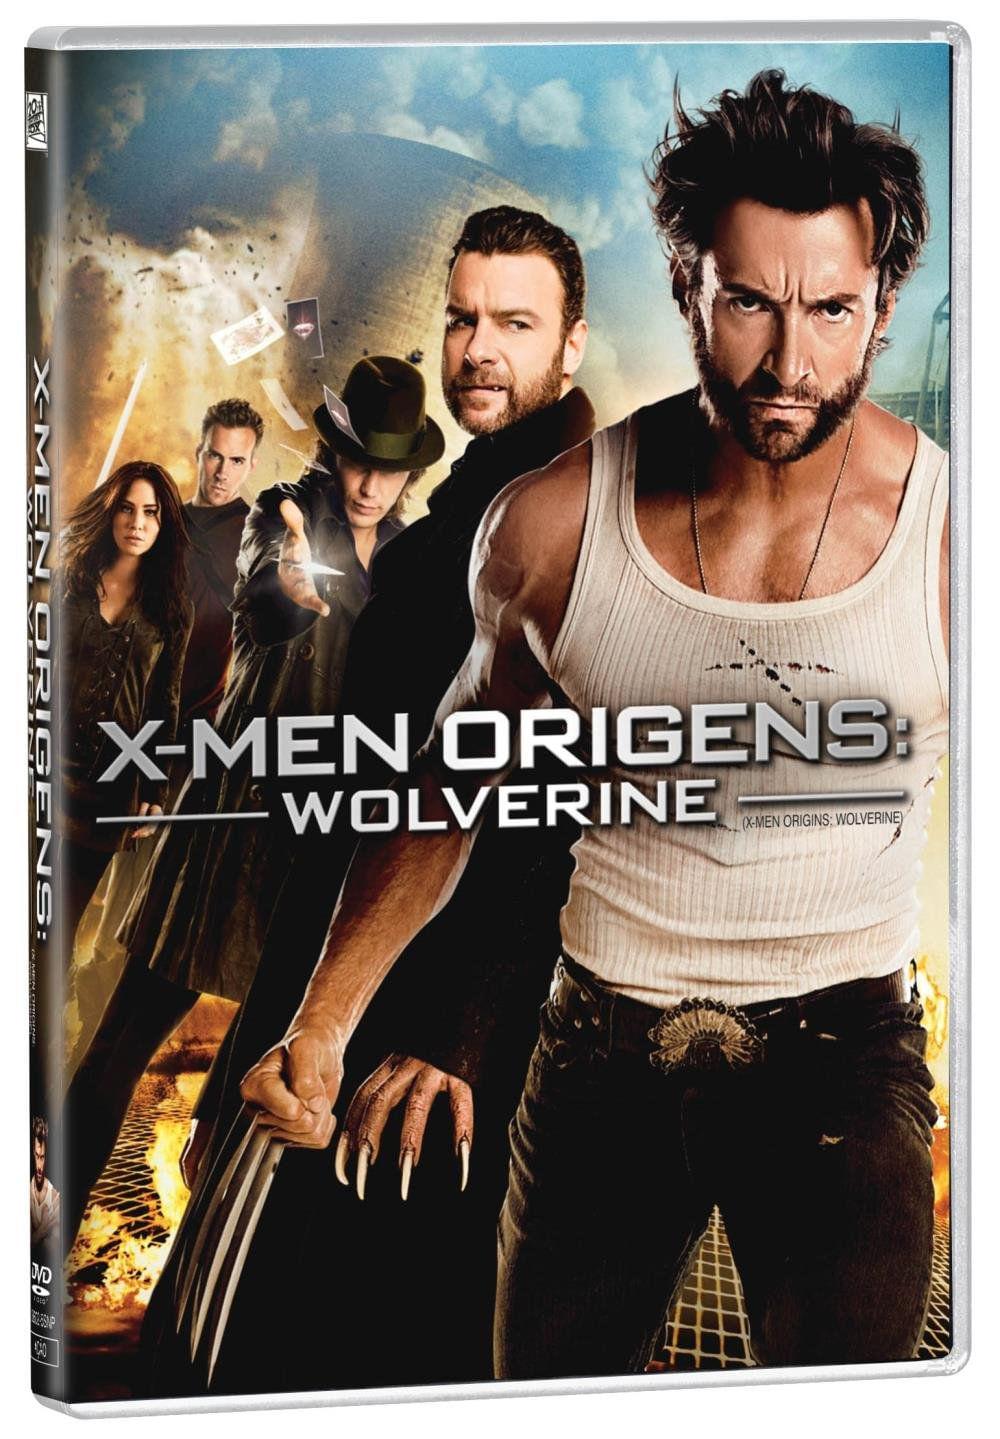 X MEN ORIGENS WOLVERINE DVD